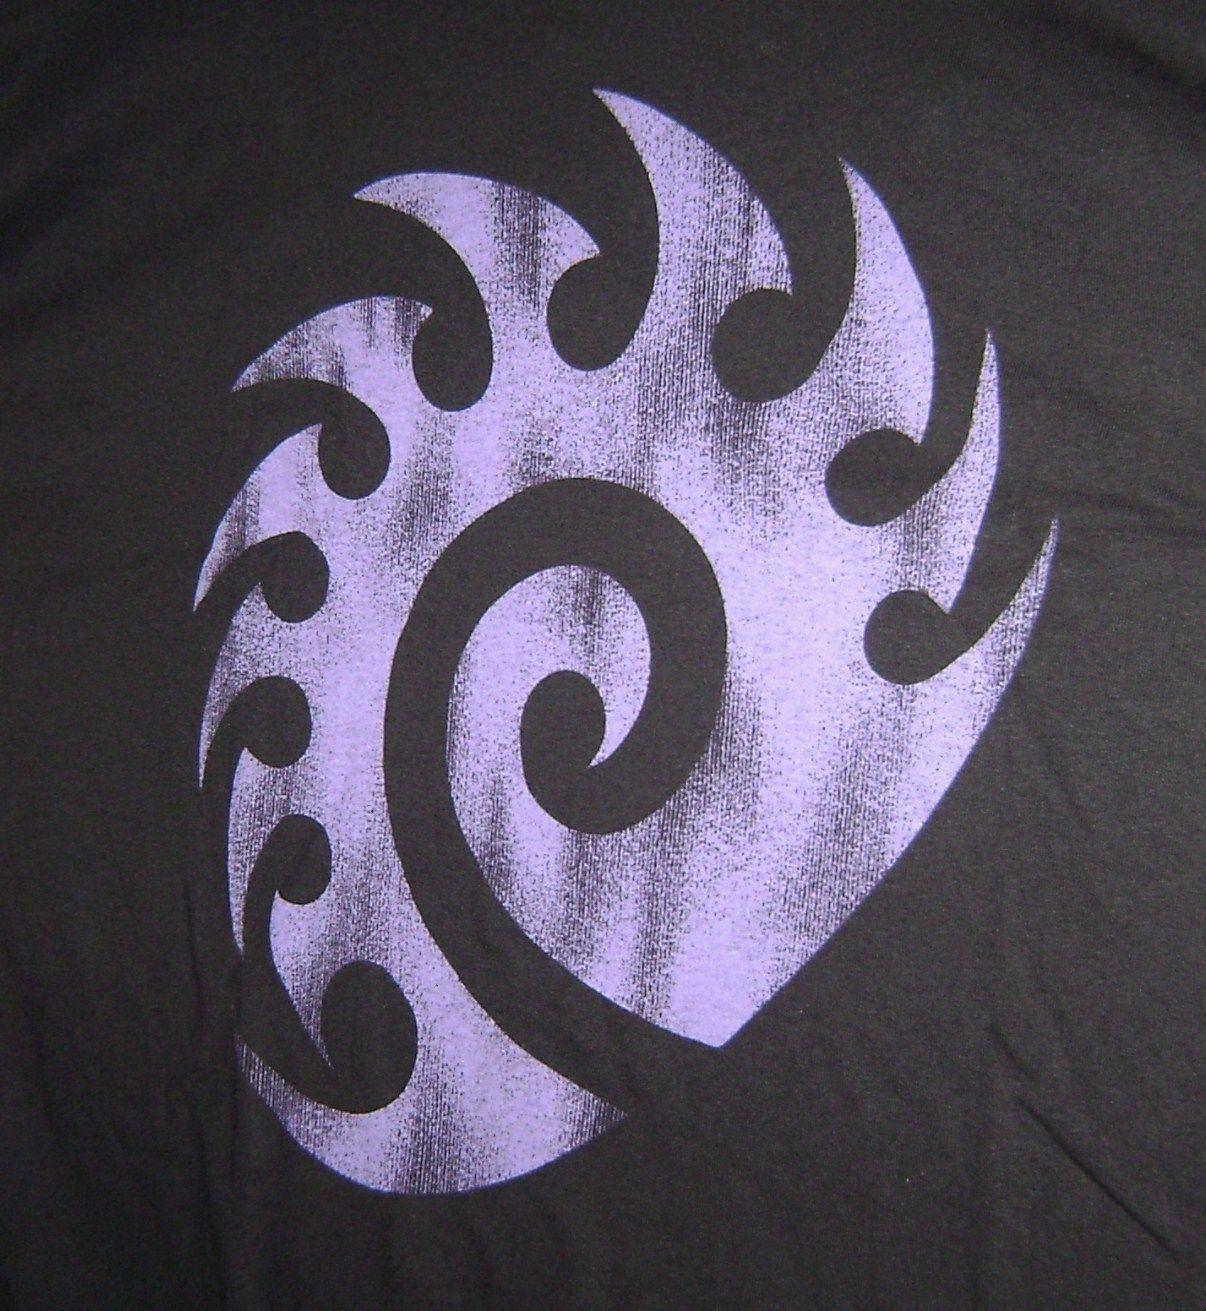 Starcraft Ii Zerg Logo Game T Shirt Xl New Blizzard Tee Products